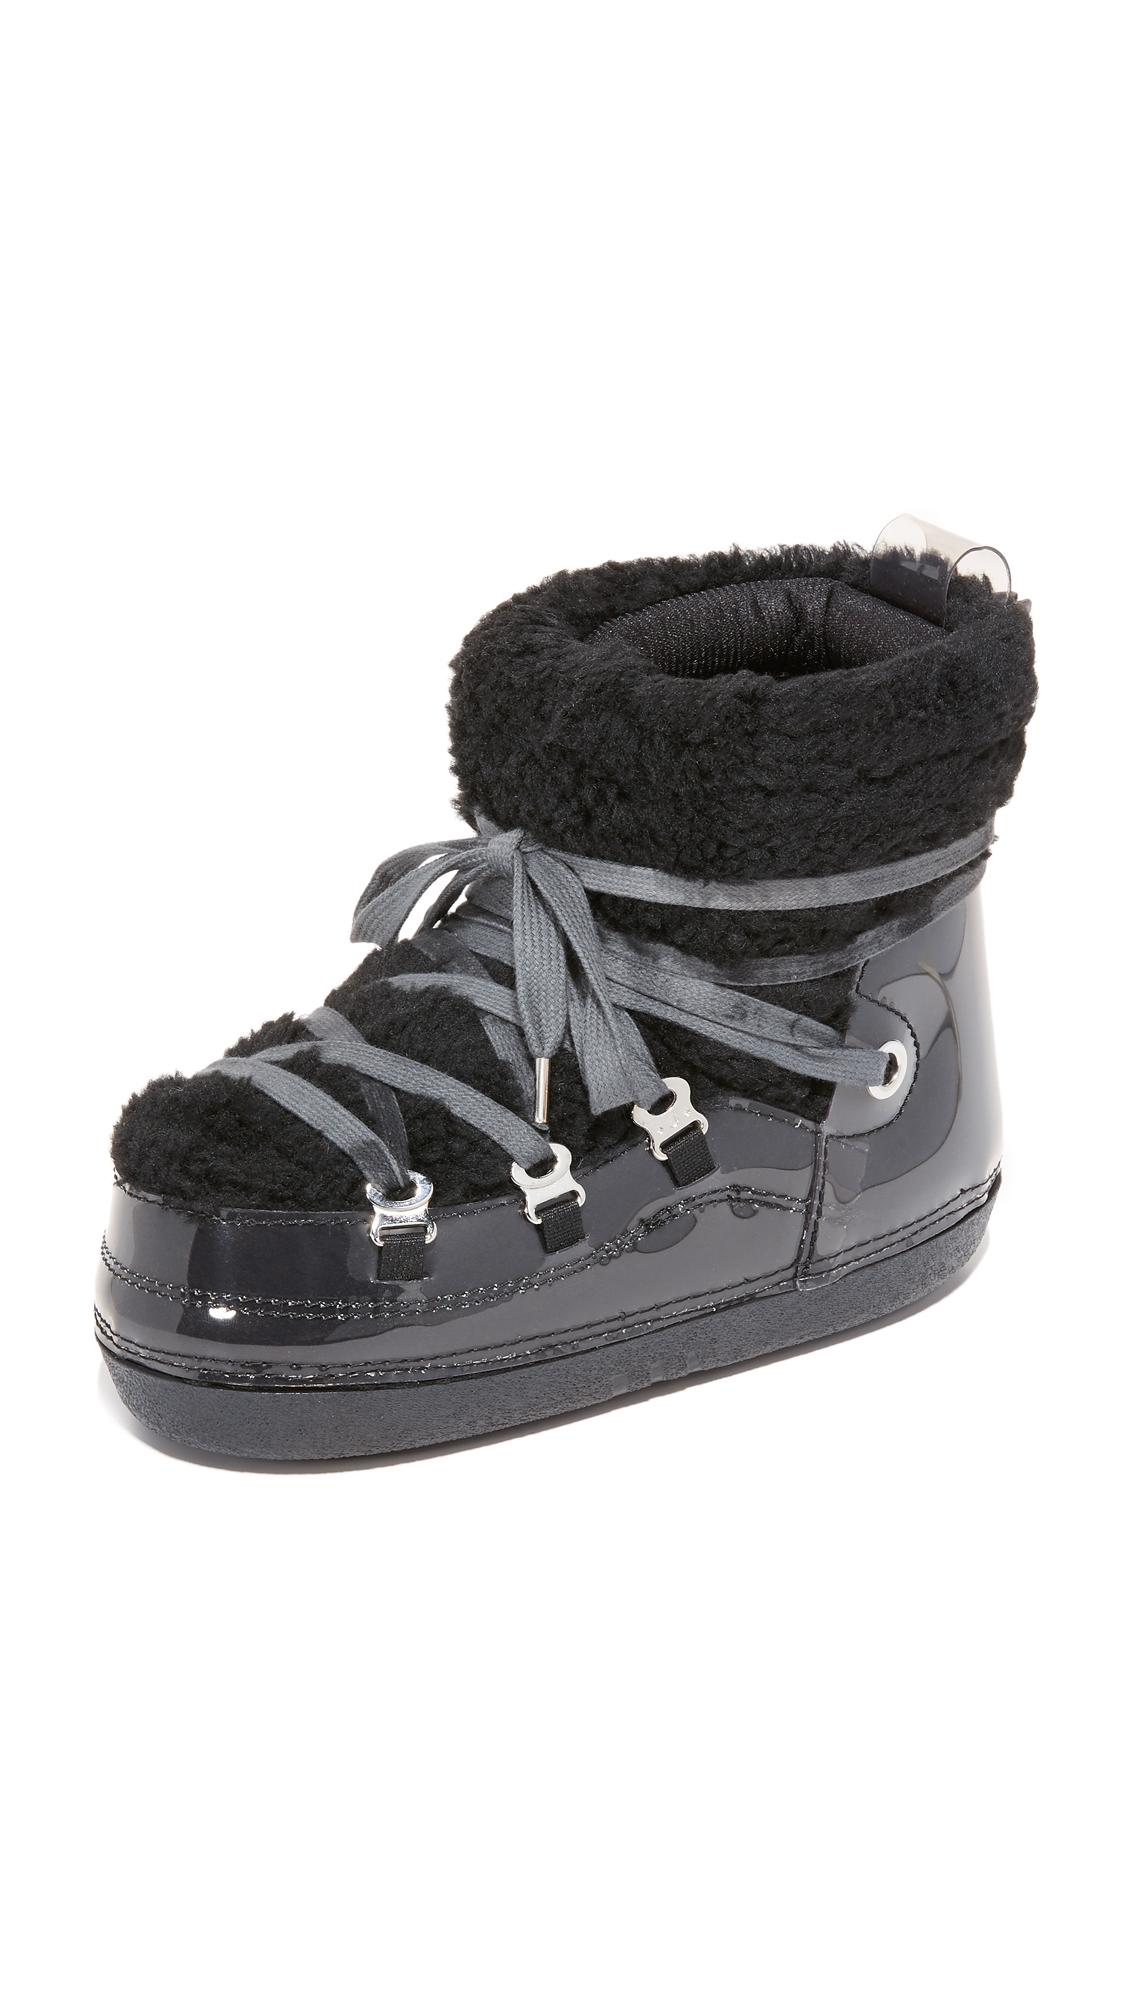 Mm6 Eskimo Sneaker Booties - Black/Fume